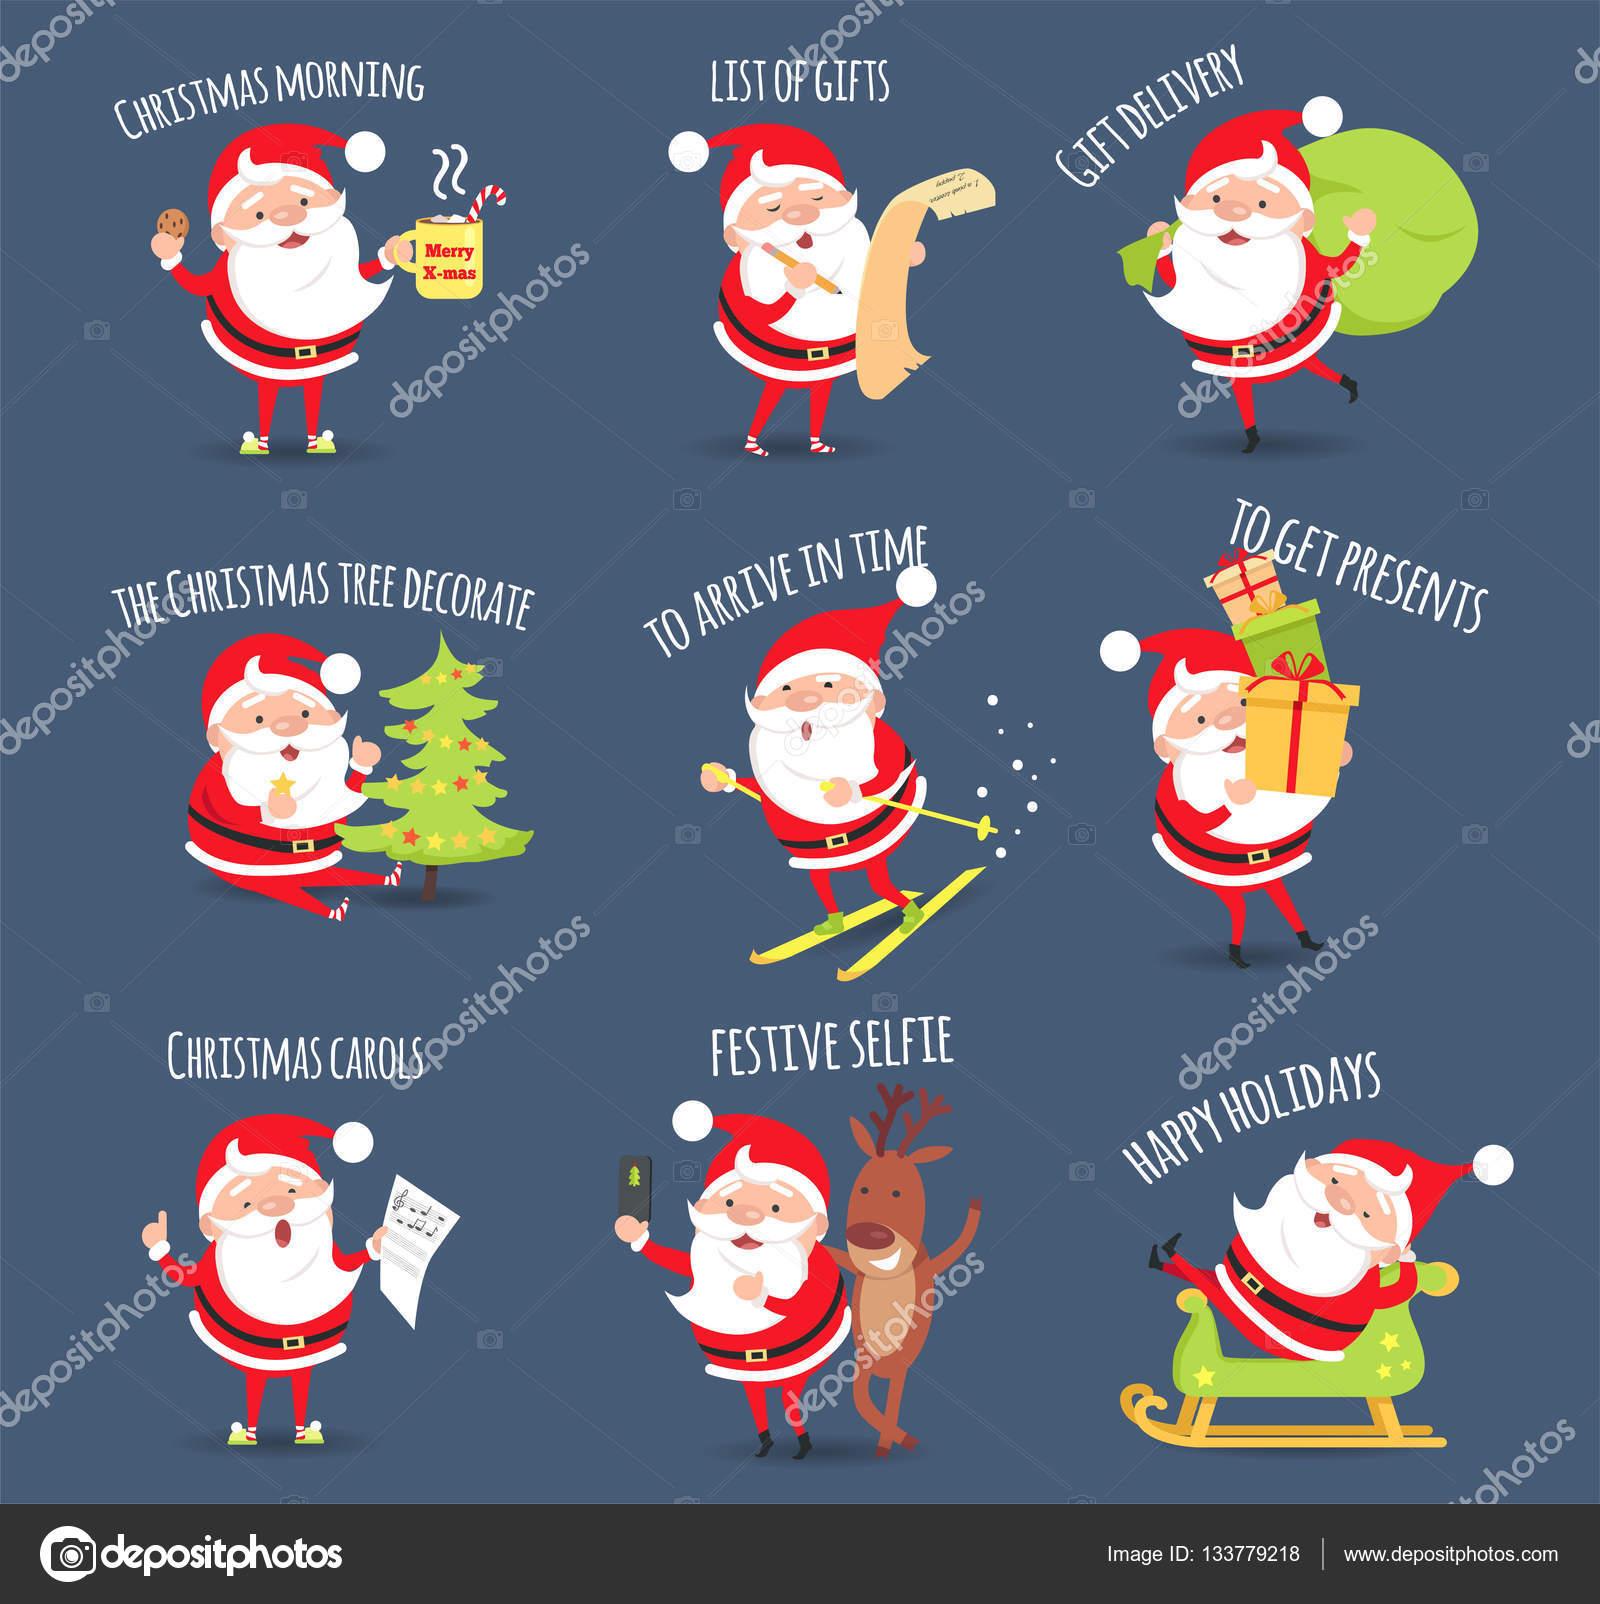 Santa-Aktivitäten. Weihnachten Frohe Festtage. Vektor — Stockvektor ...